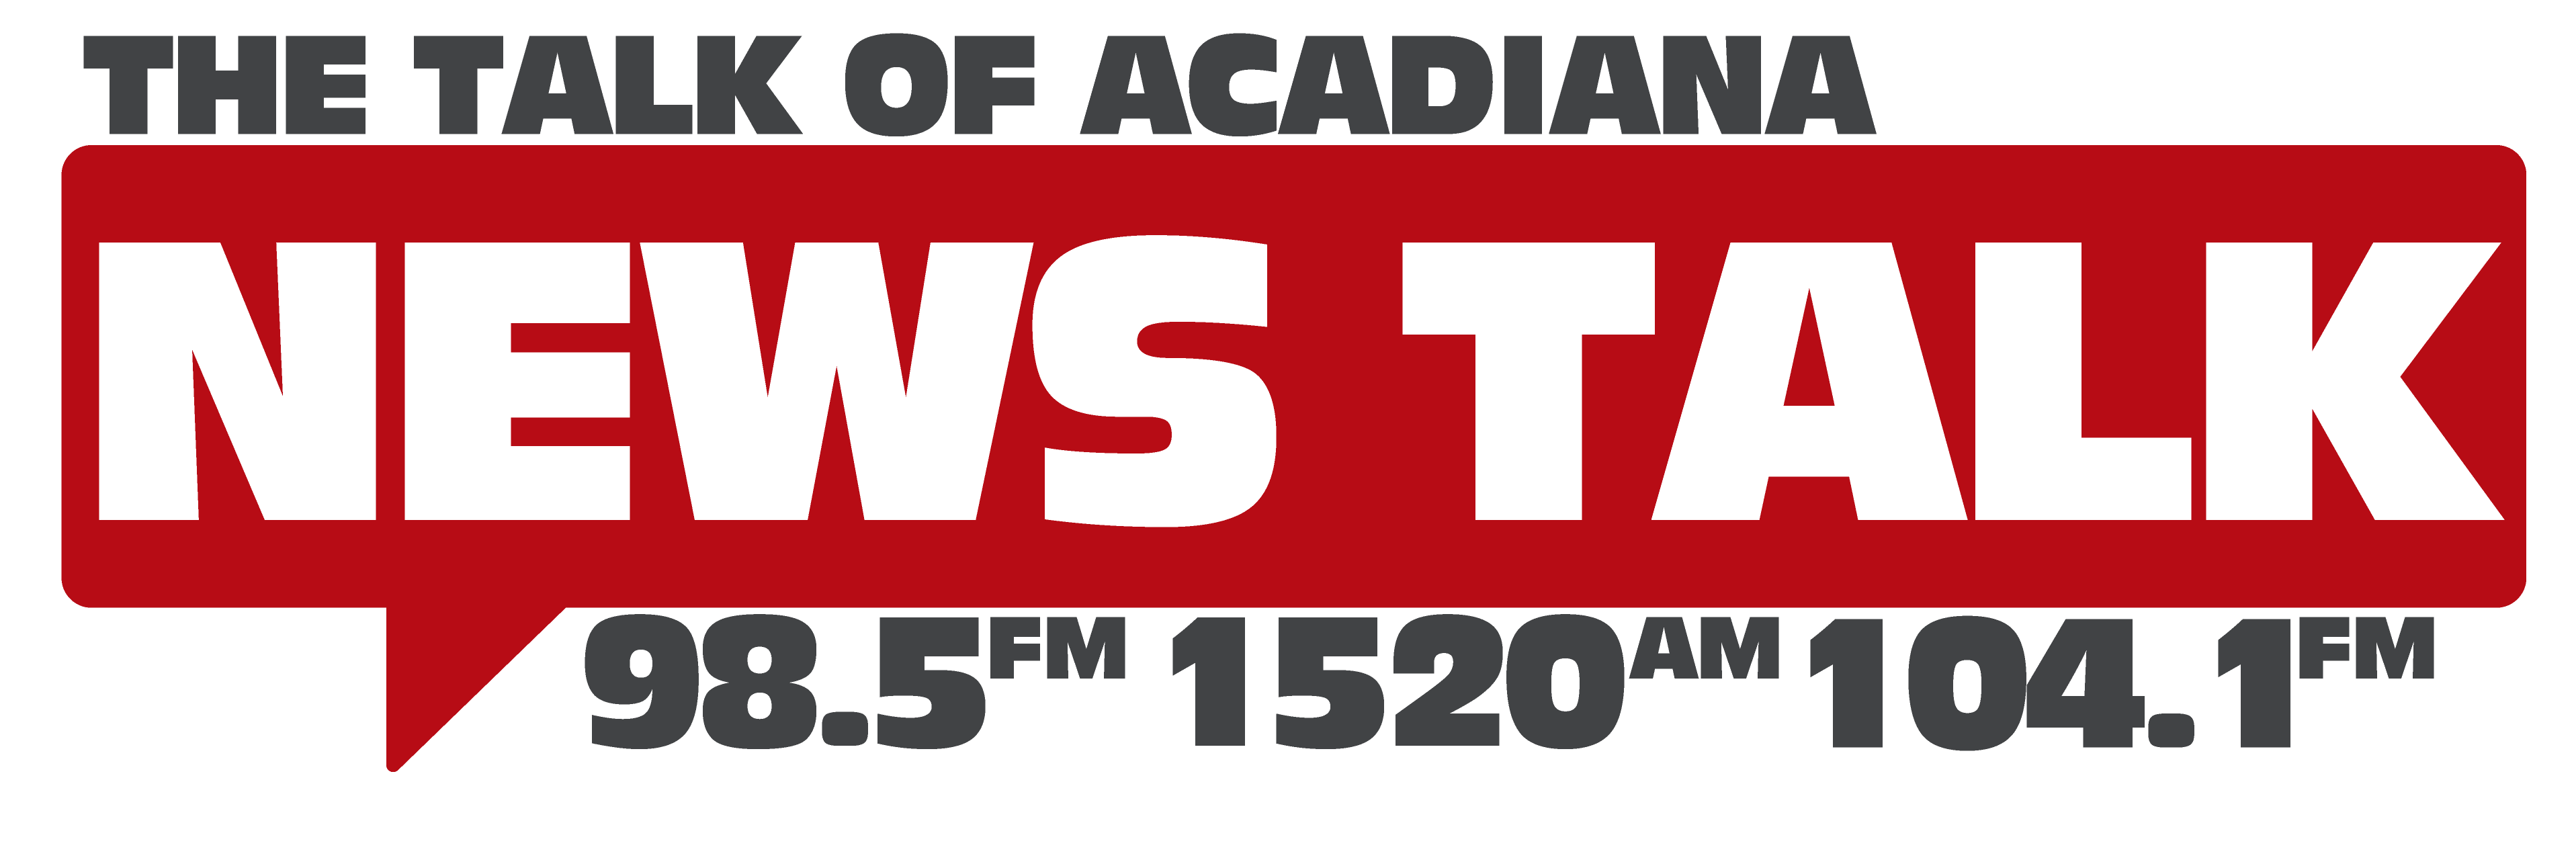 365x138_dmc-website_Newstalk-logo